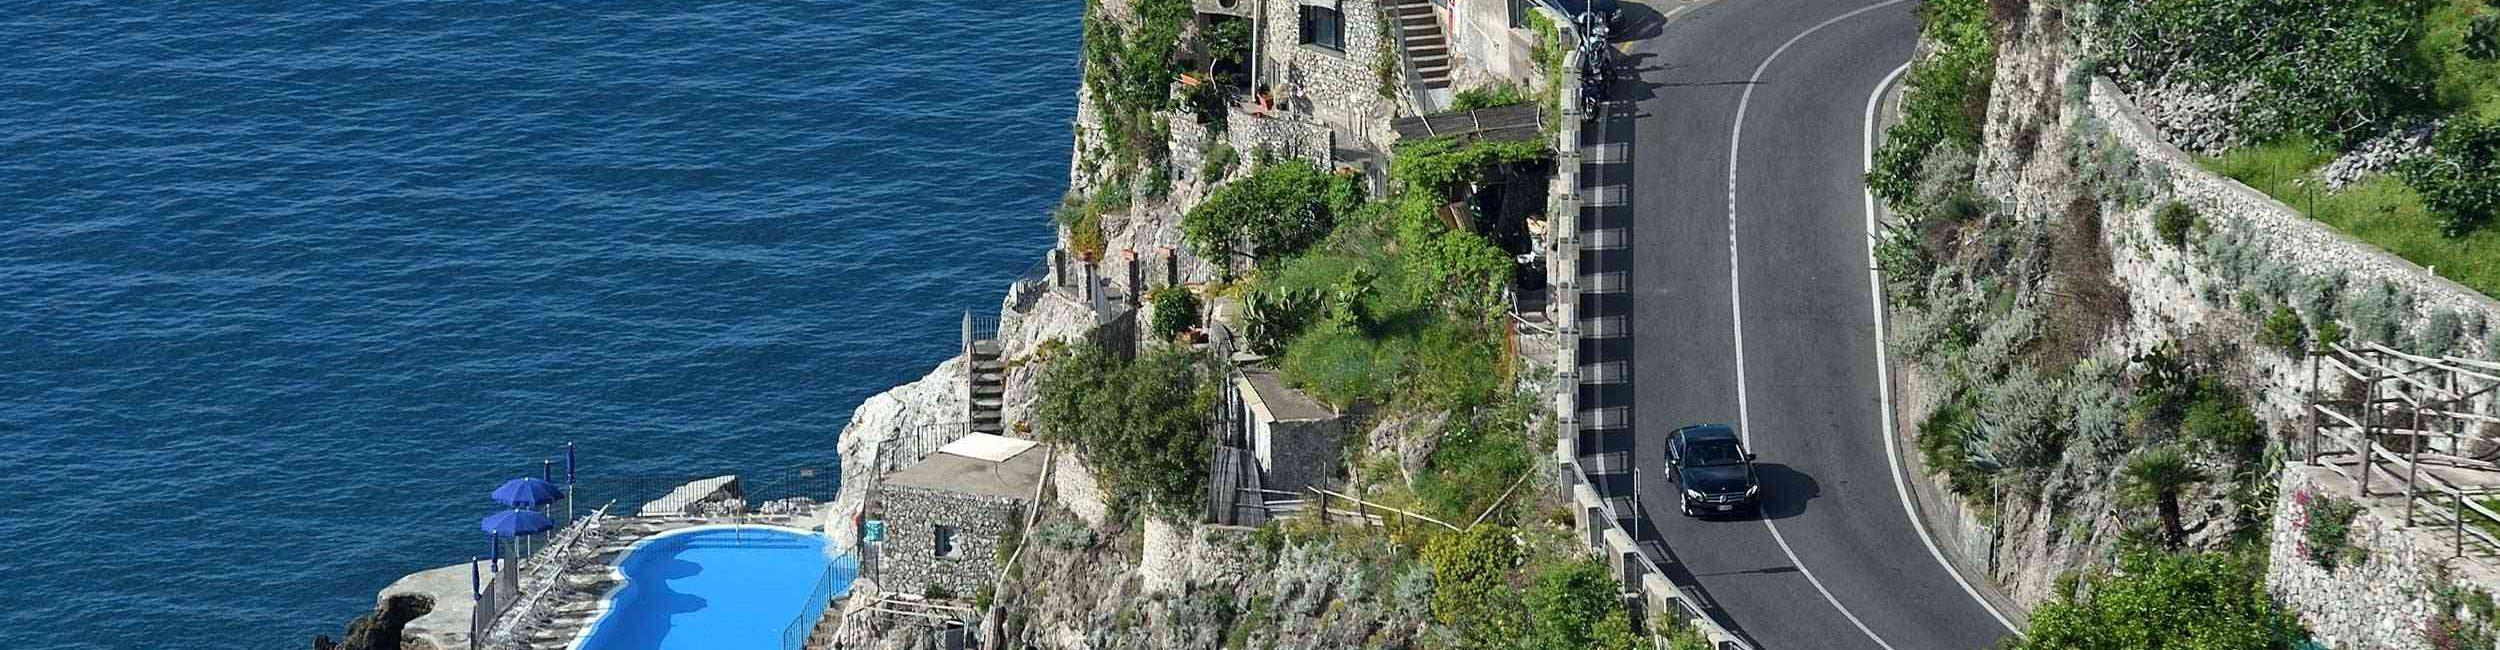 Amalfi-Car---Amalfi-Coast-Trip-and-Emotions